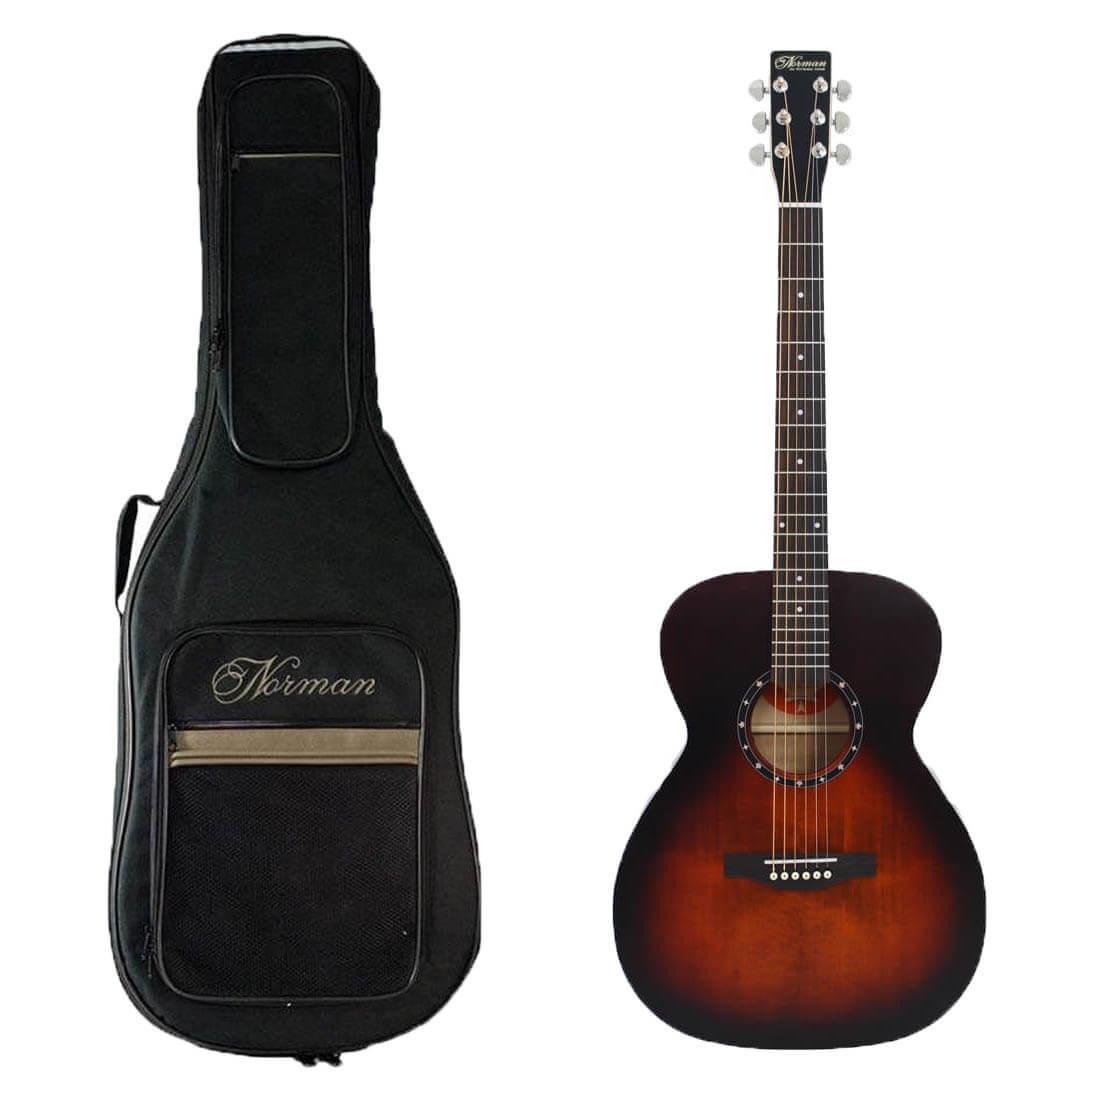 Norman Protégé B18 Cedar Concert Hall western-guitar med taske